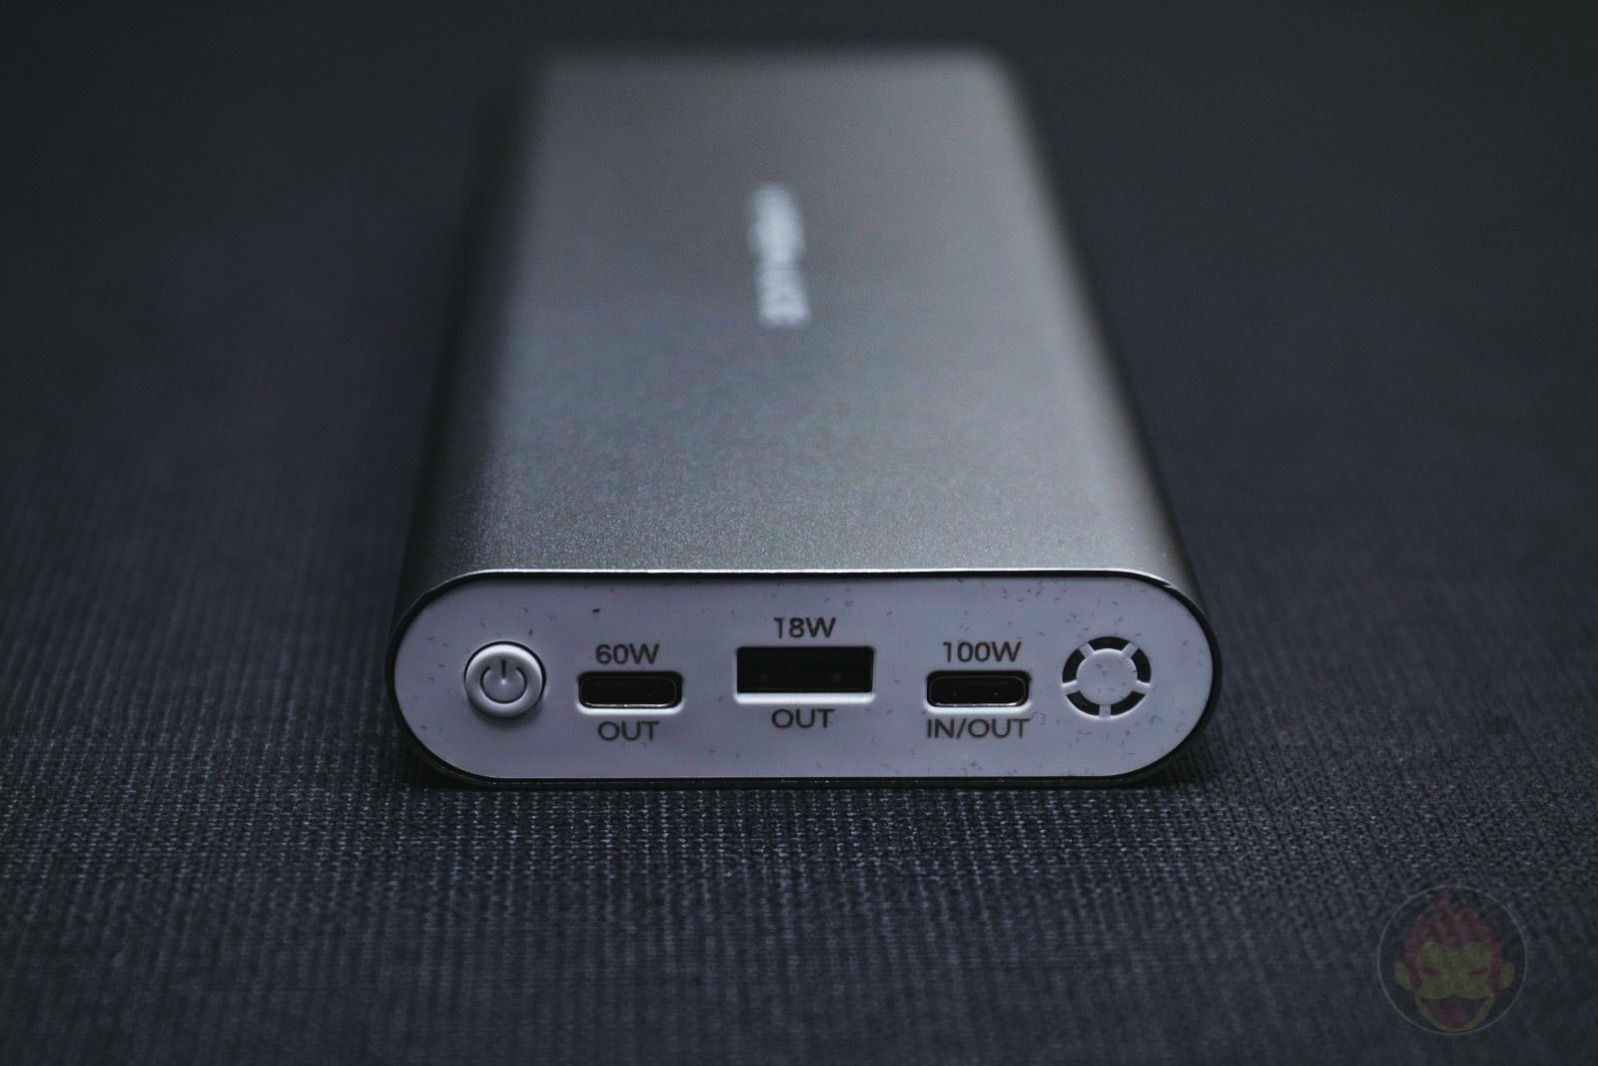 HyperJuice-100W-Mobile-Battery-Review-05.jpg